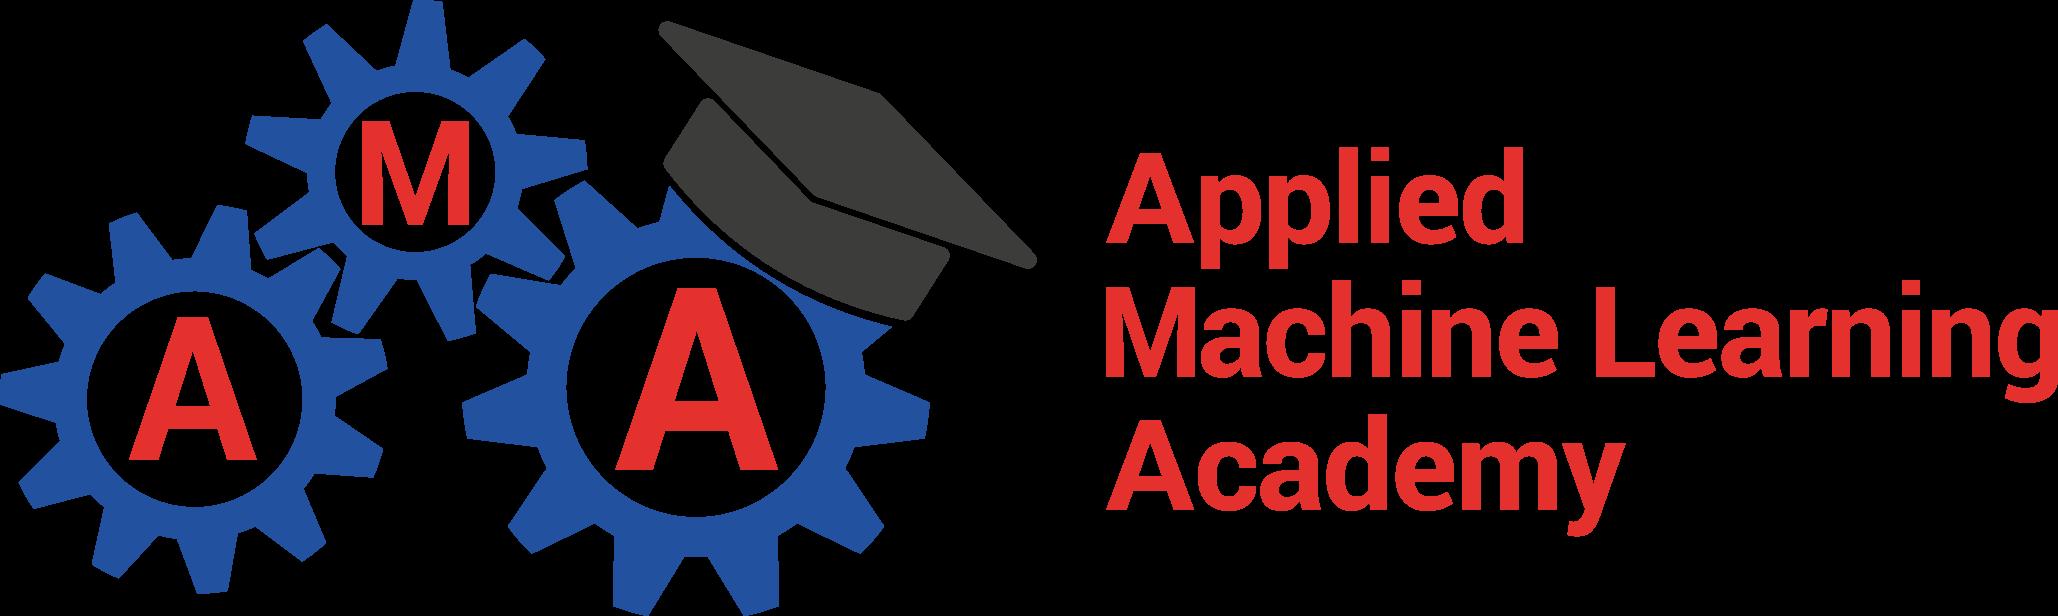 AMA – Applied  Machine Learning Academy